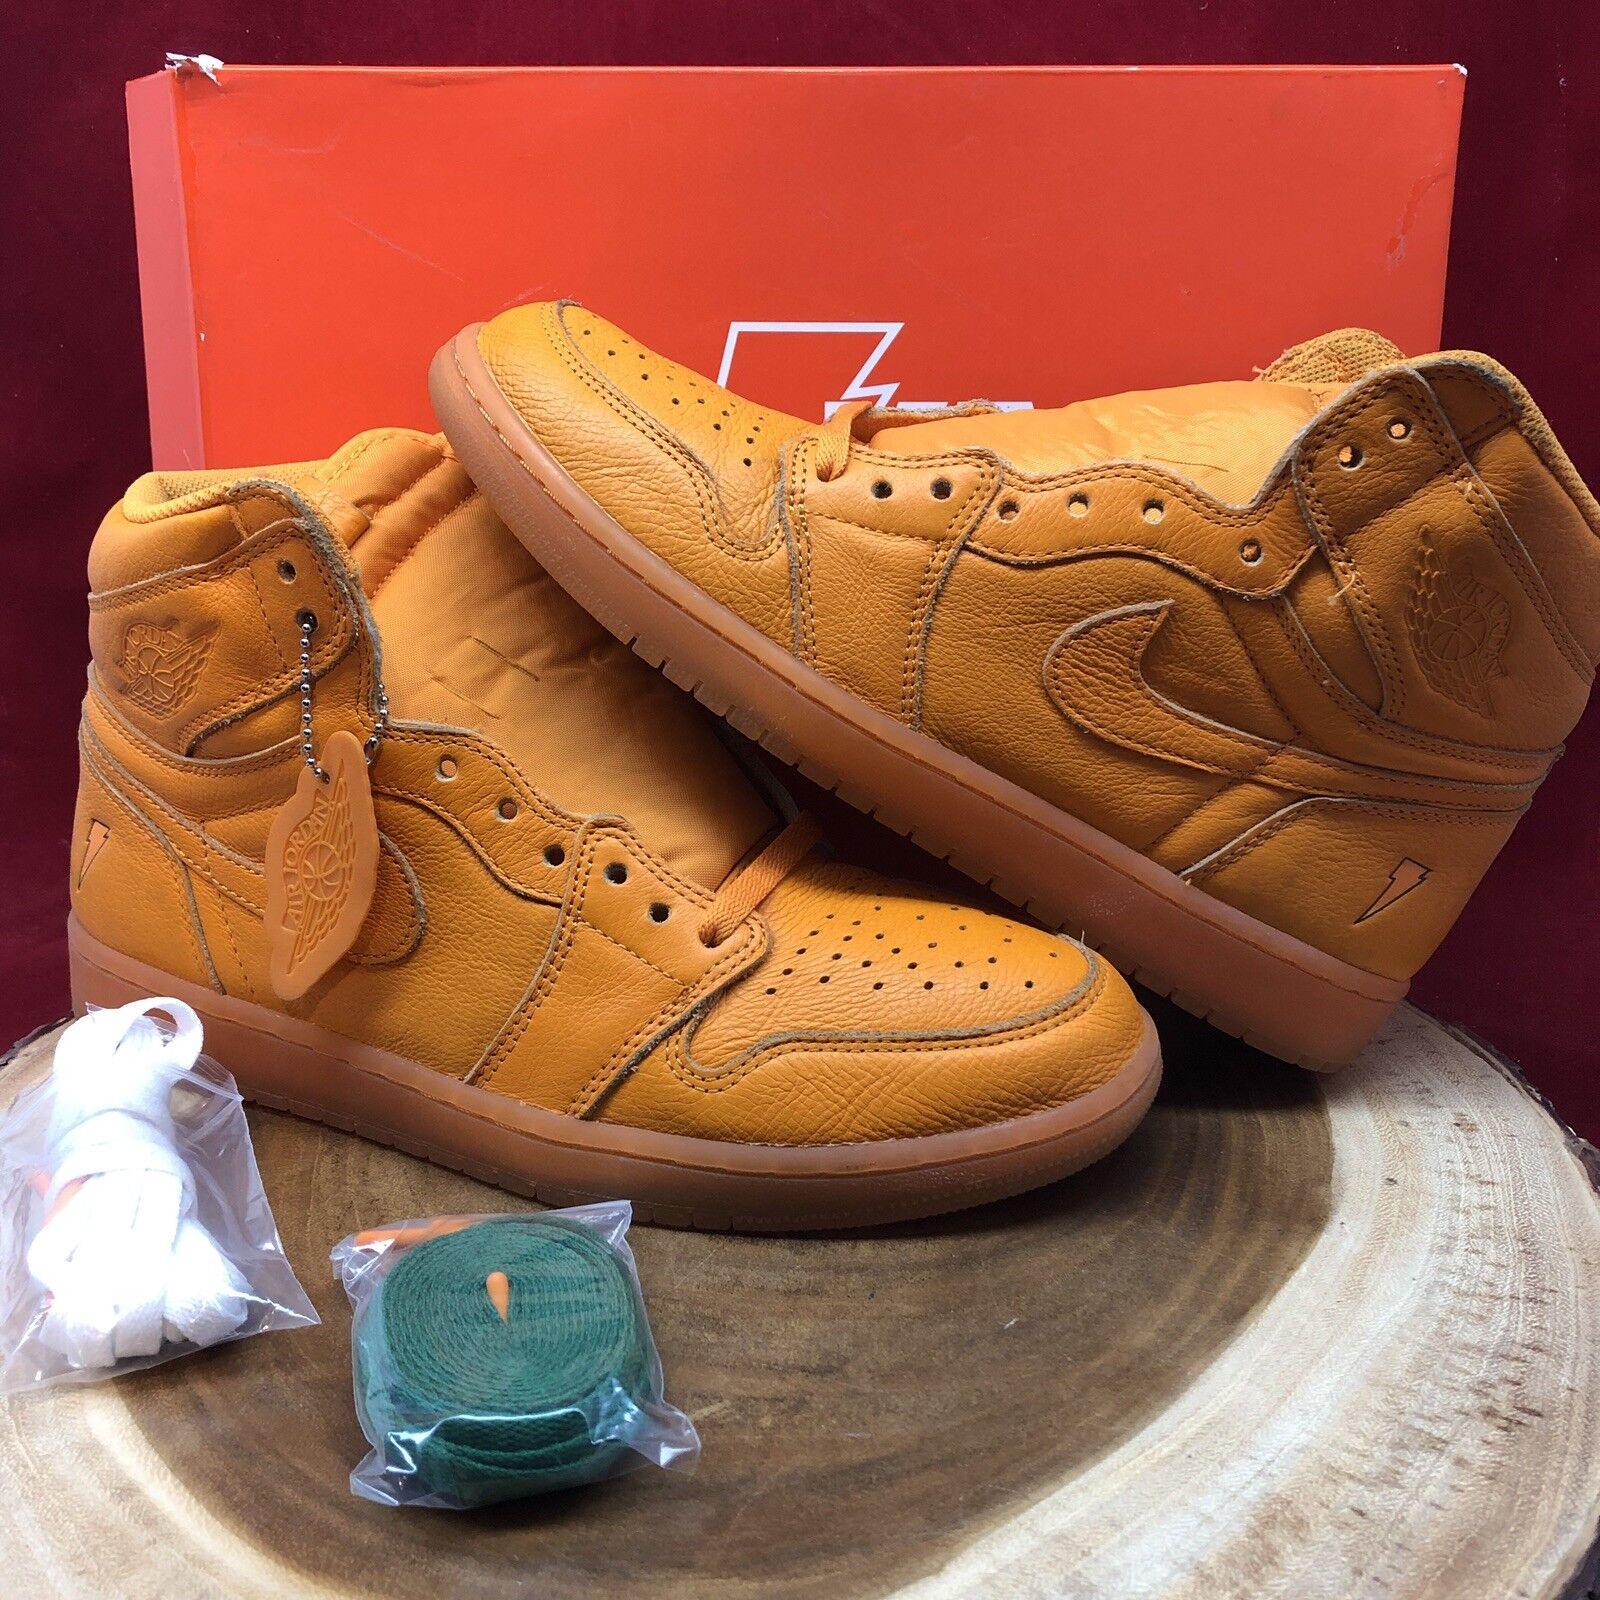 Nike Air Jordan Retro I orange Gatorade Like Mike Size 10 AJ5997 880 Green VI XI